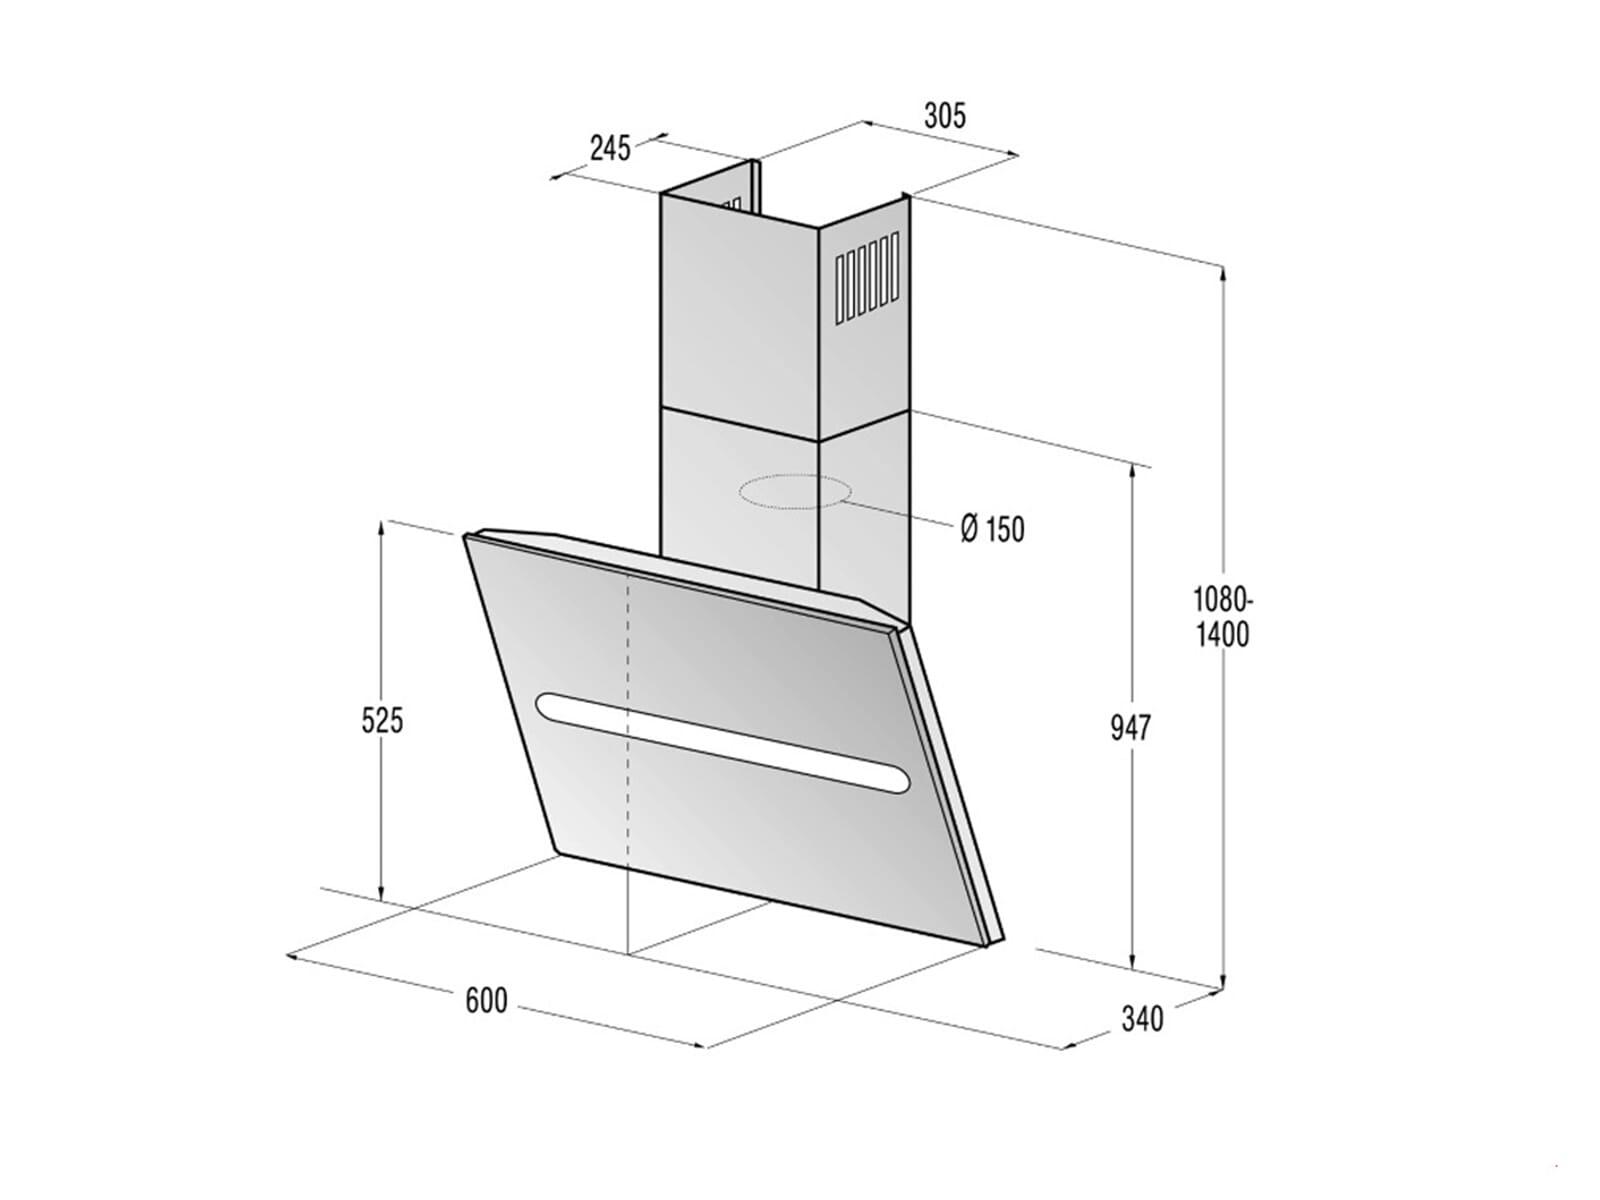 gorenje dvg 6540 bi kopffrei wand dunstabzugshaube edelstahl glas schwarz ebay. Black Bedroom Furniture Sets. Home Design Ideas